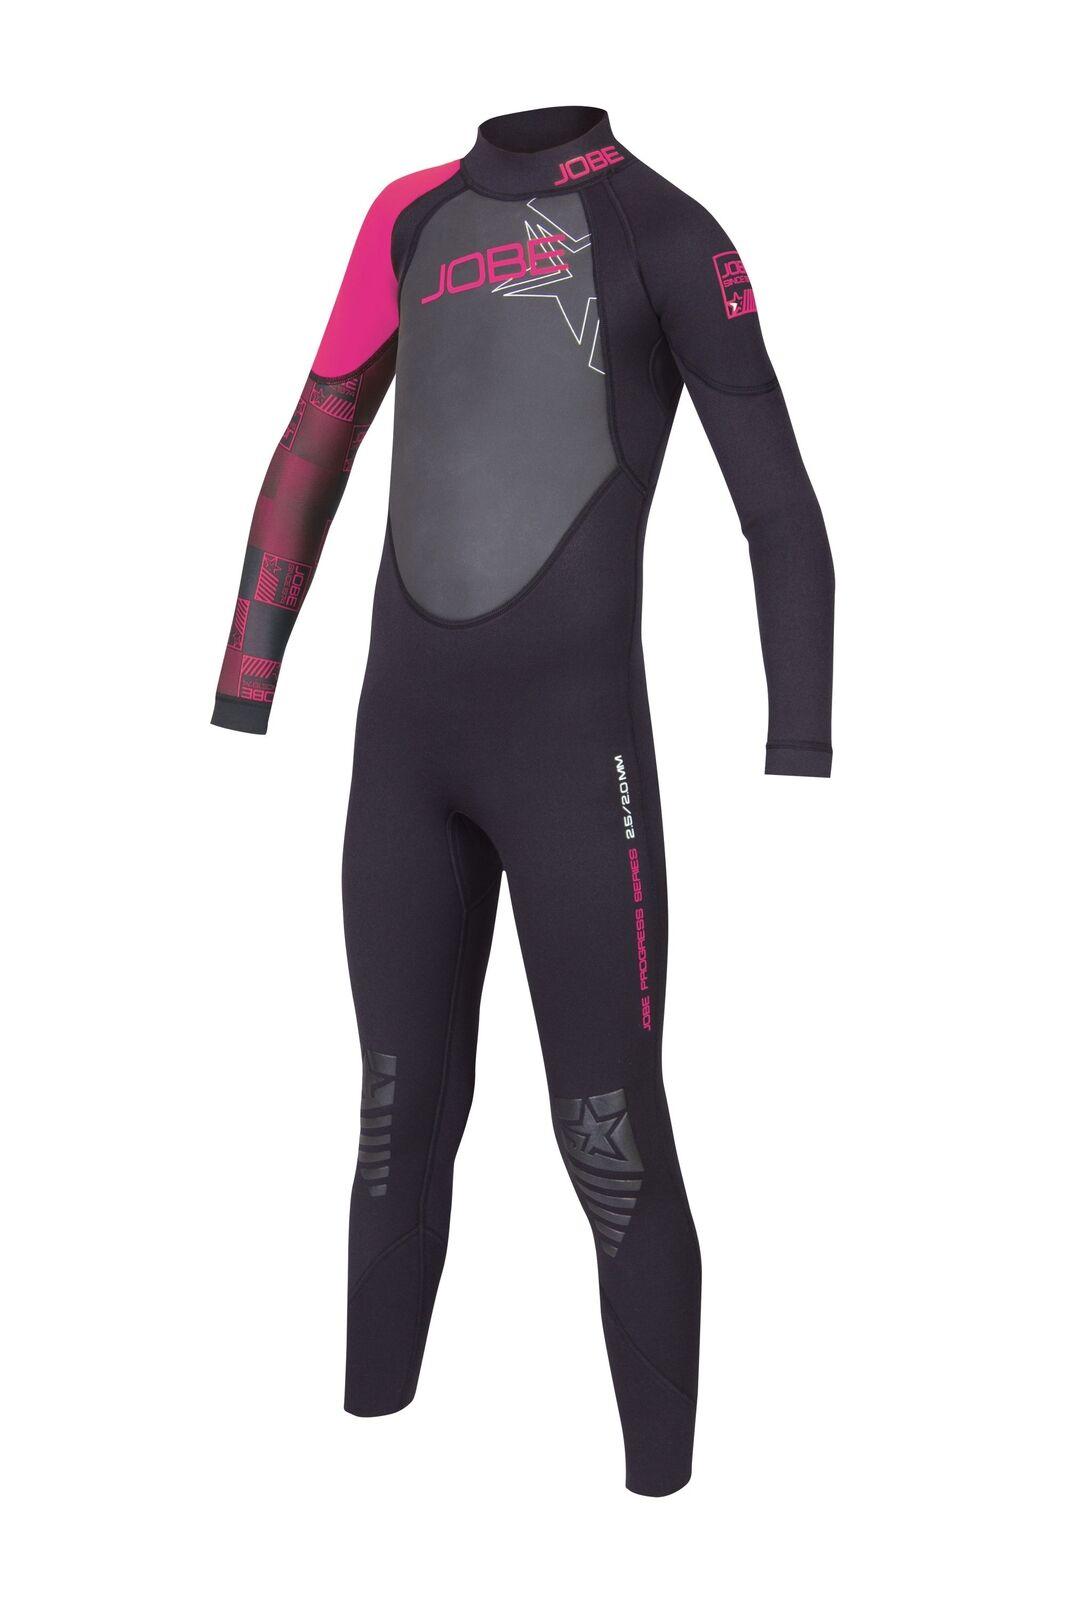 Jobe progress full Suit Youth 3.0 2.5 rosadodo niños neopreno traje talla XXS (98 104)